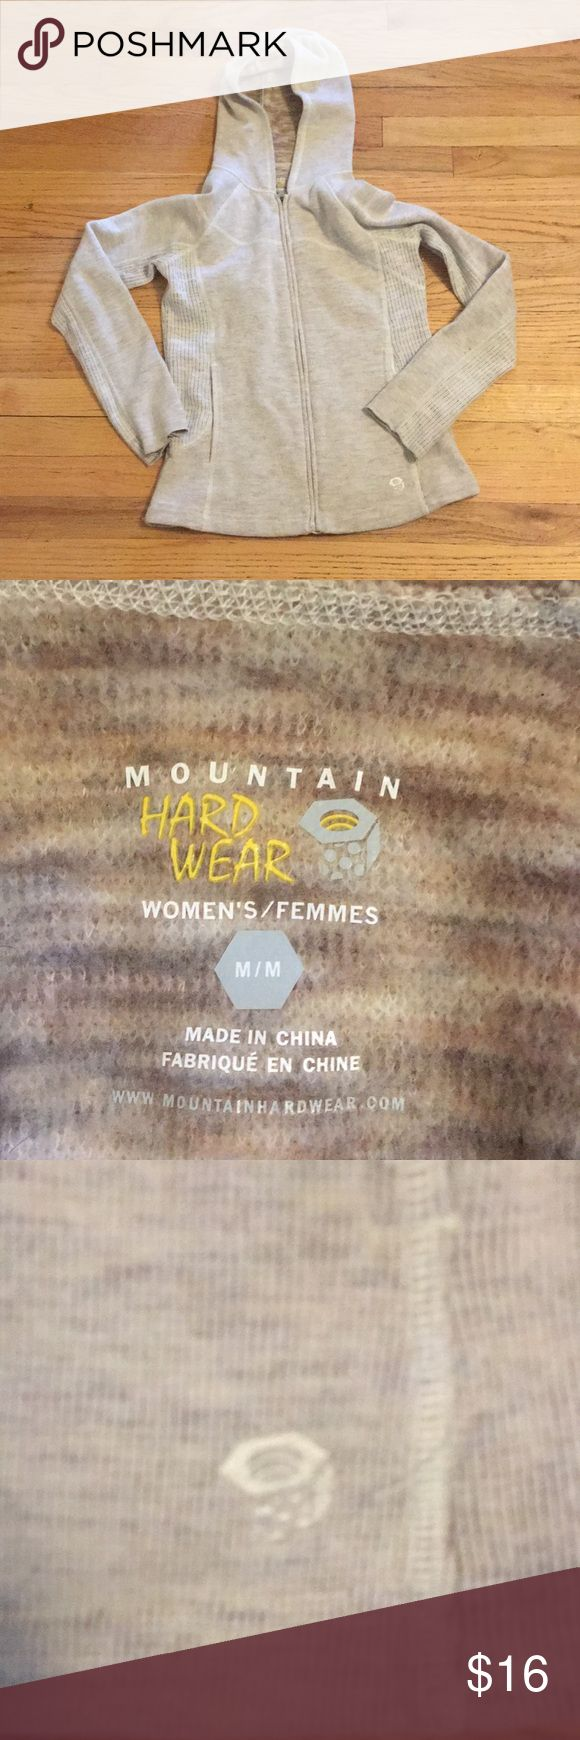 Mountain hardware zip up sweater hoodie Sized medium. GUC. Mountain Hardwear Tops Sweatshirts & Hoodies